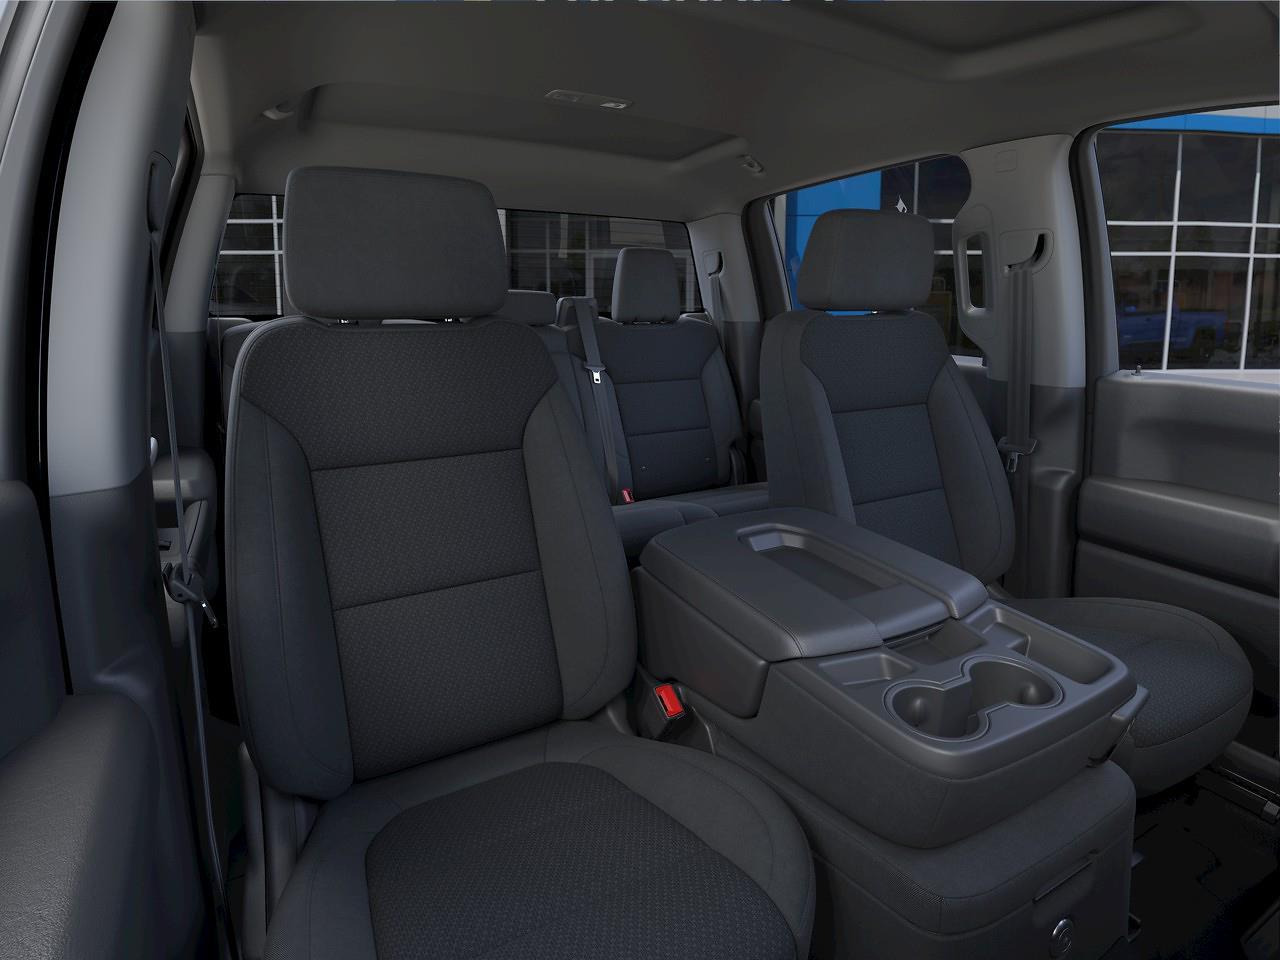 2021 Chevrolet Silverado 1500 Crew Cab 4x4, Pickup #Q210444 - photo 13